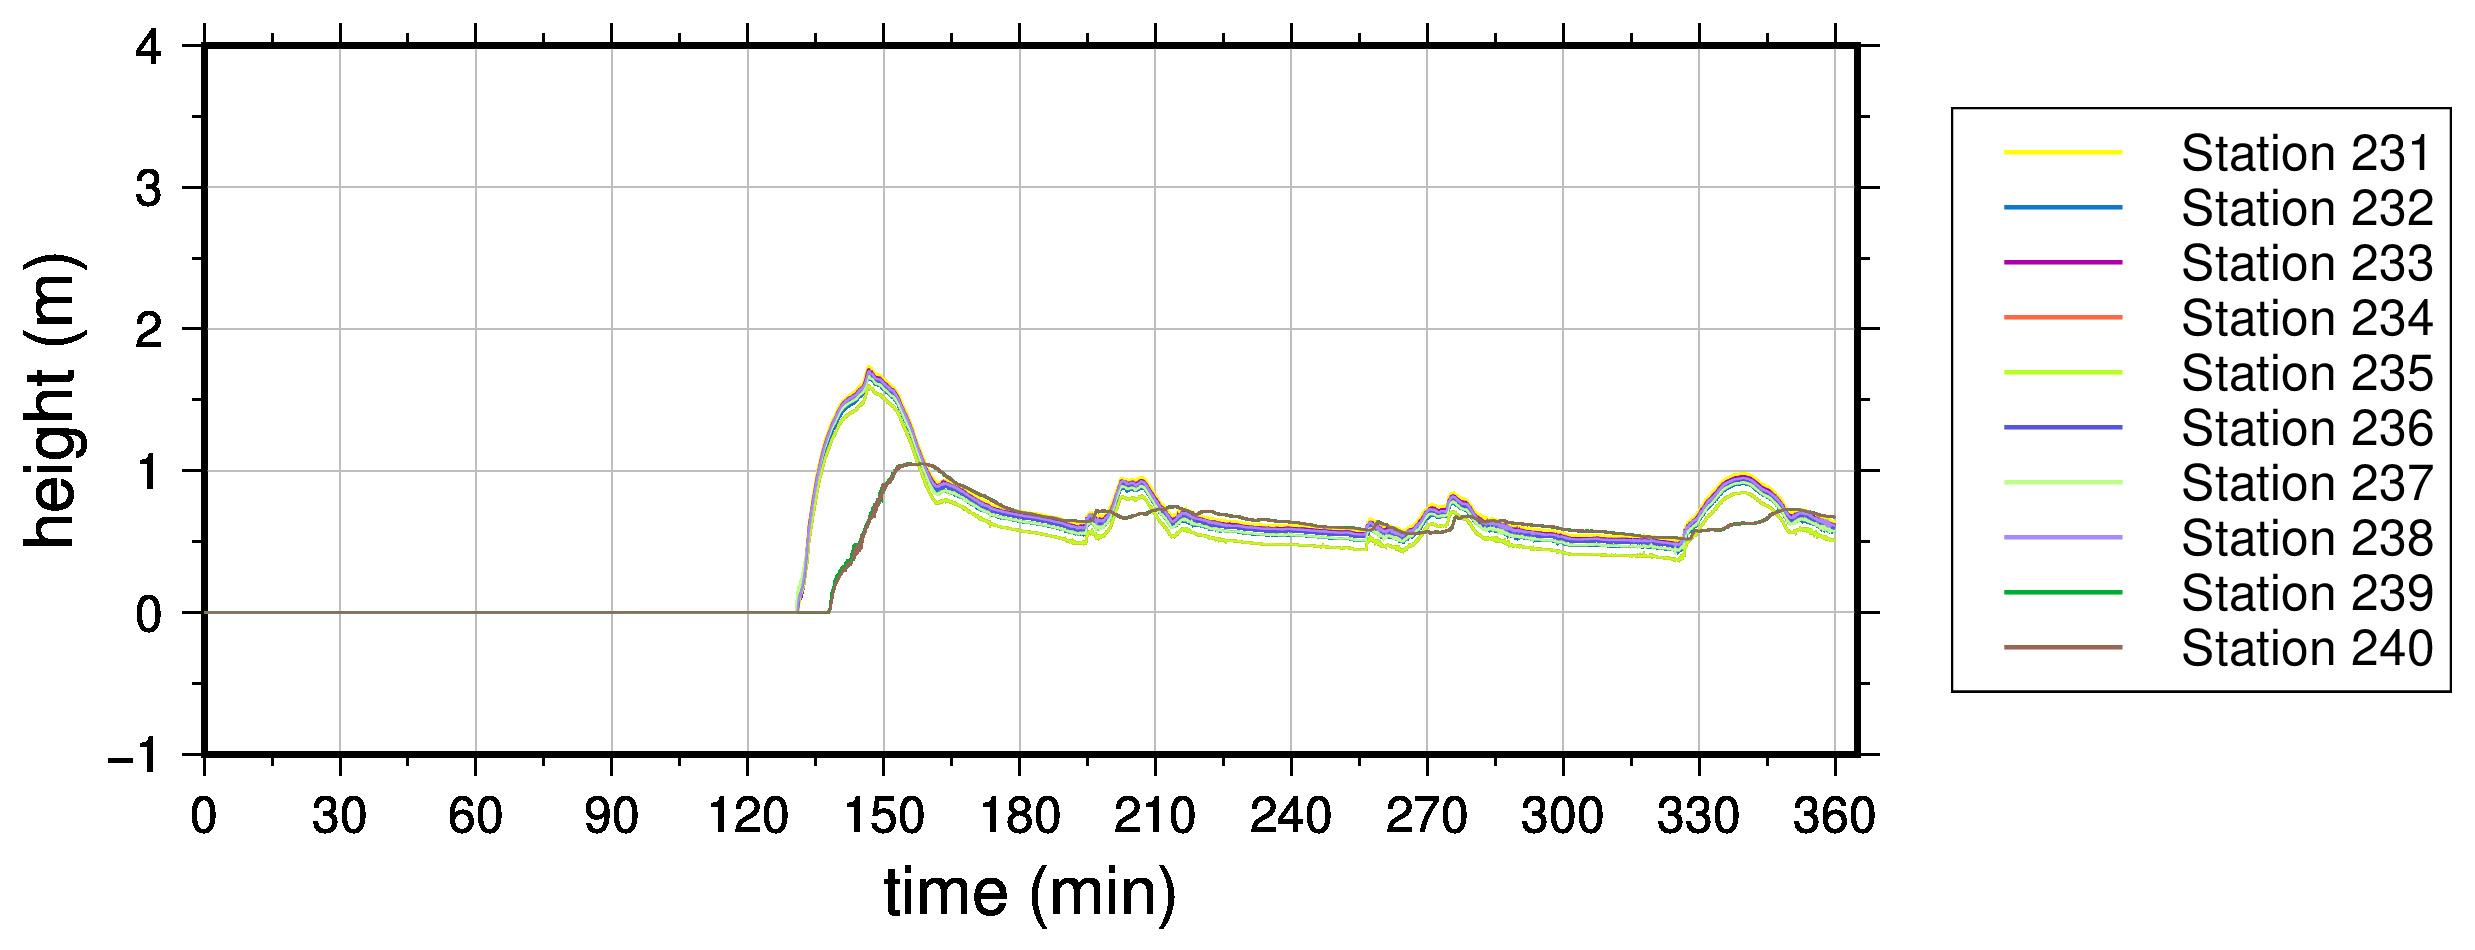 nankai03_waveform_tgs000231_10.jpg